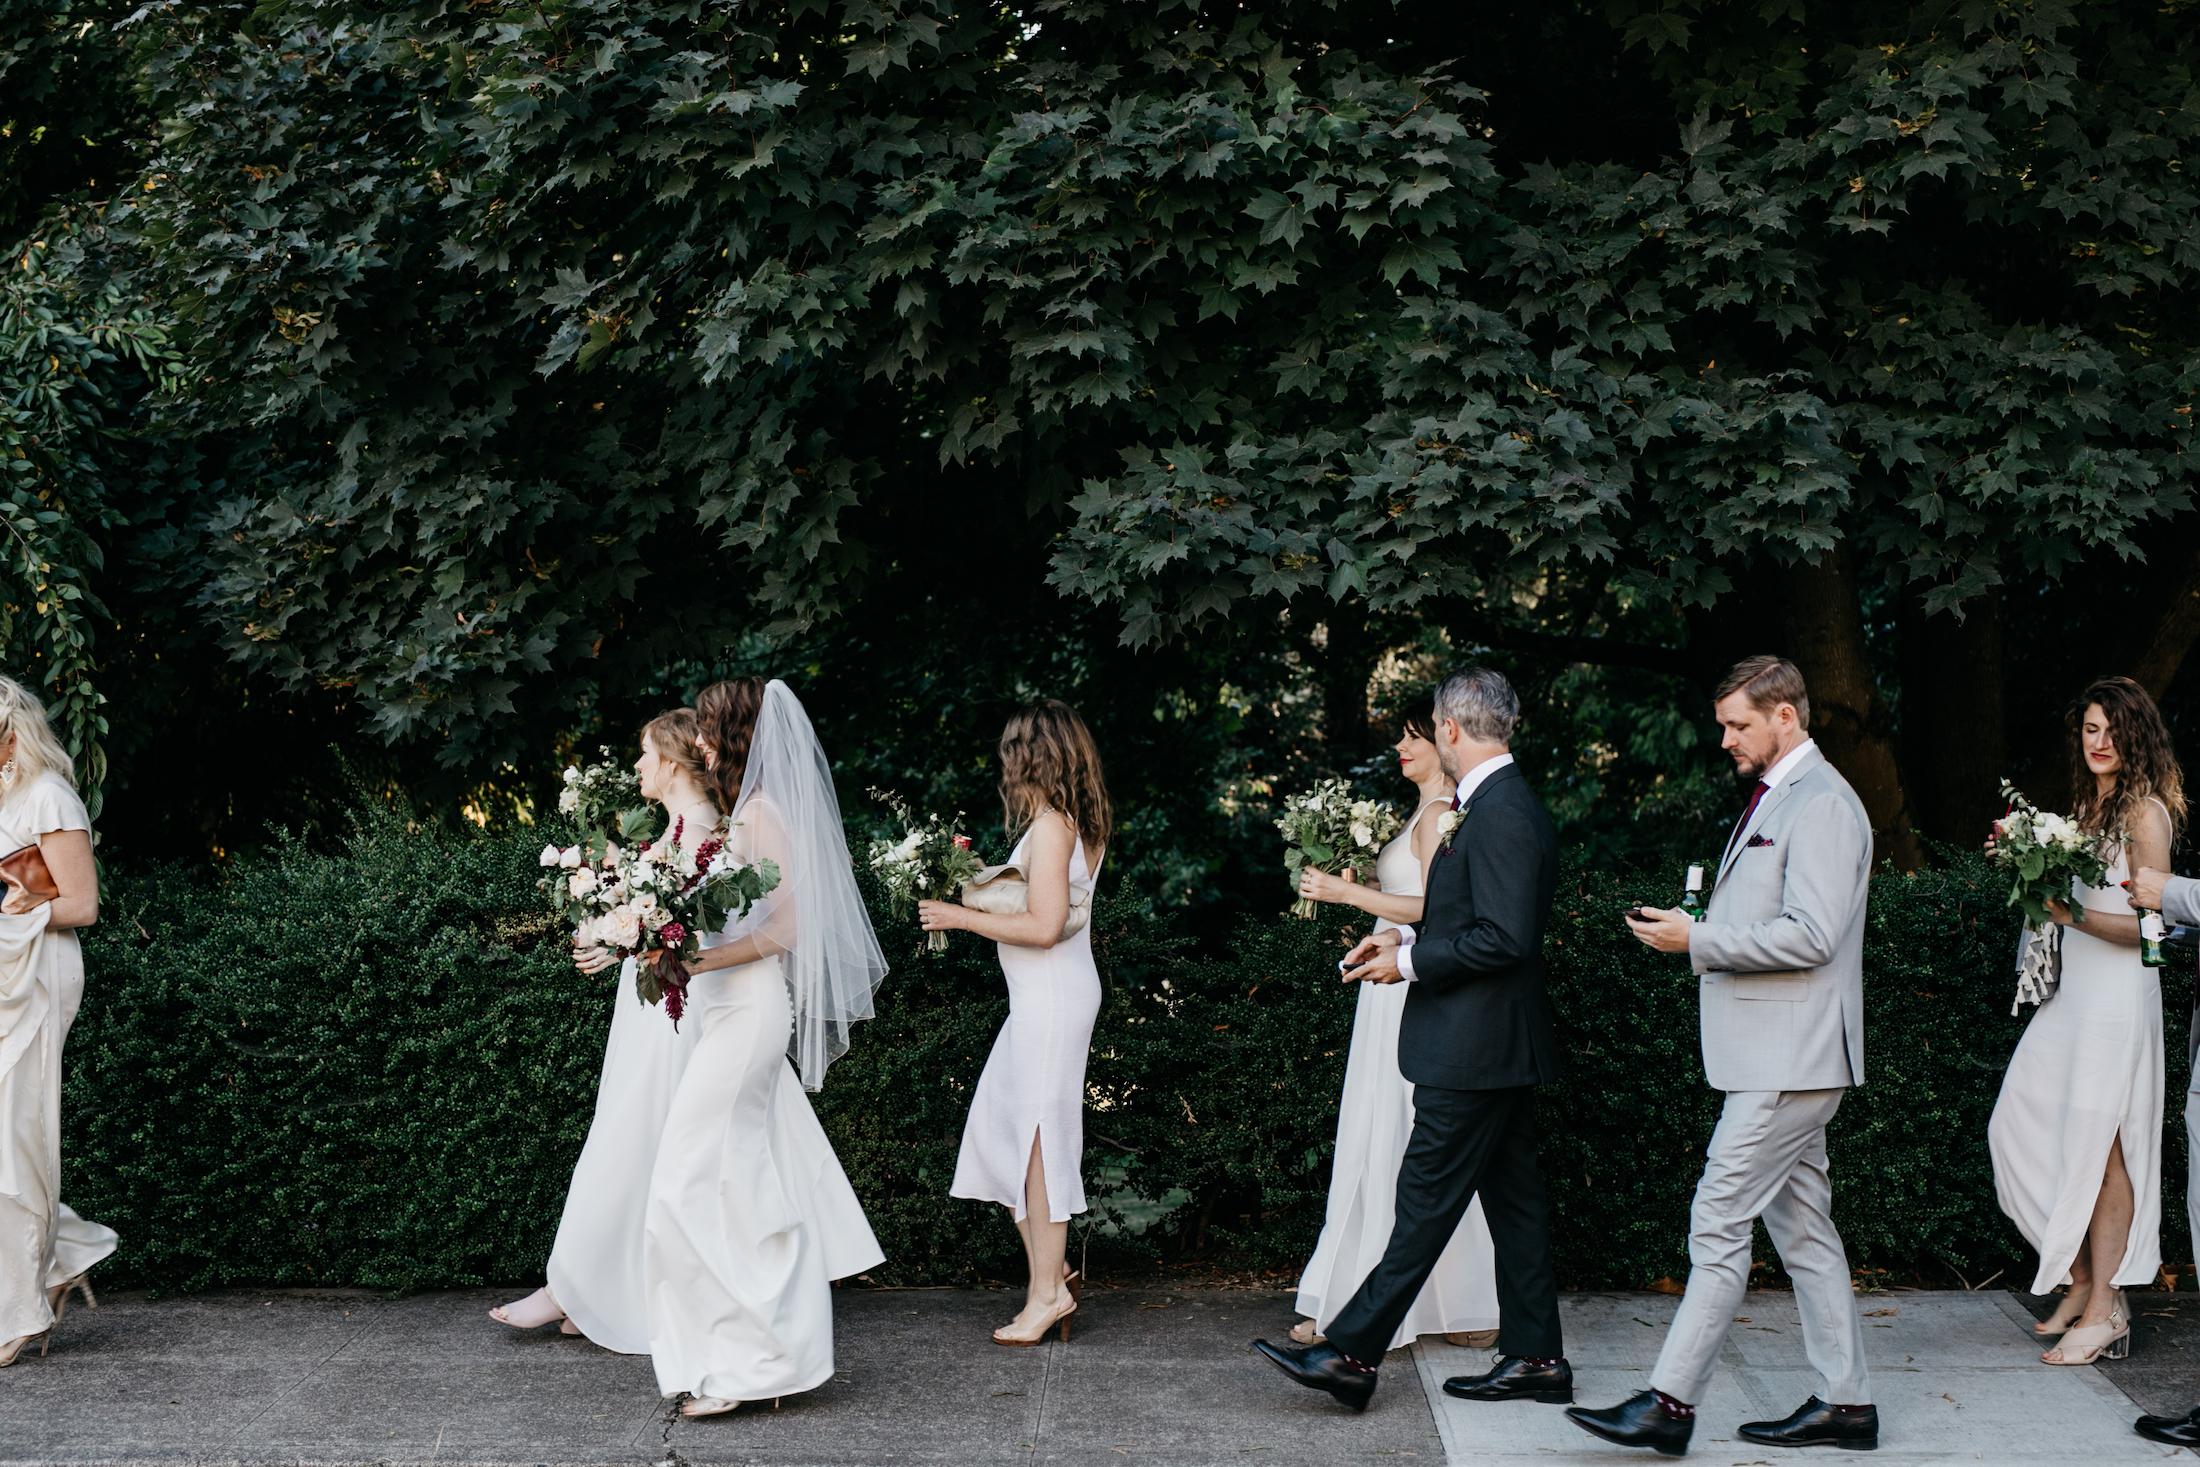 cathedral-park-portland-wedding-photographer-baker-building-wedding378.jpg